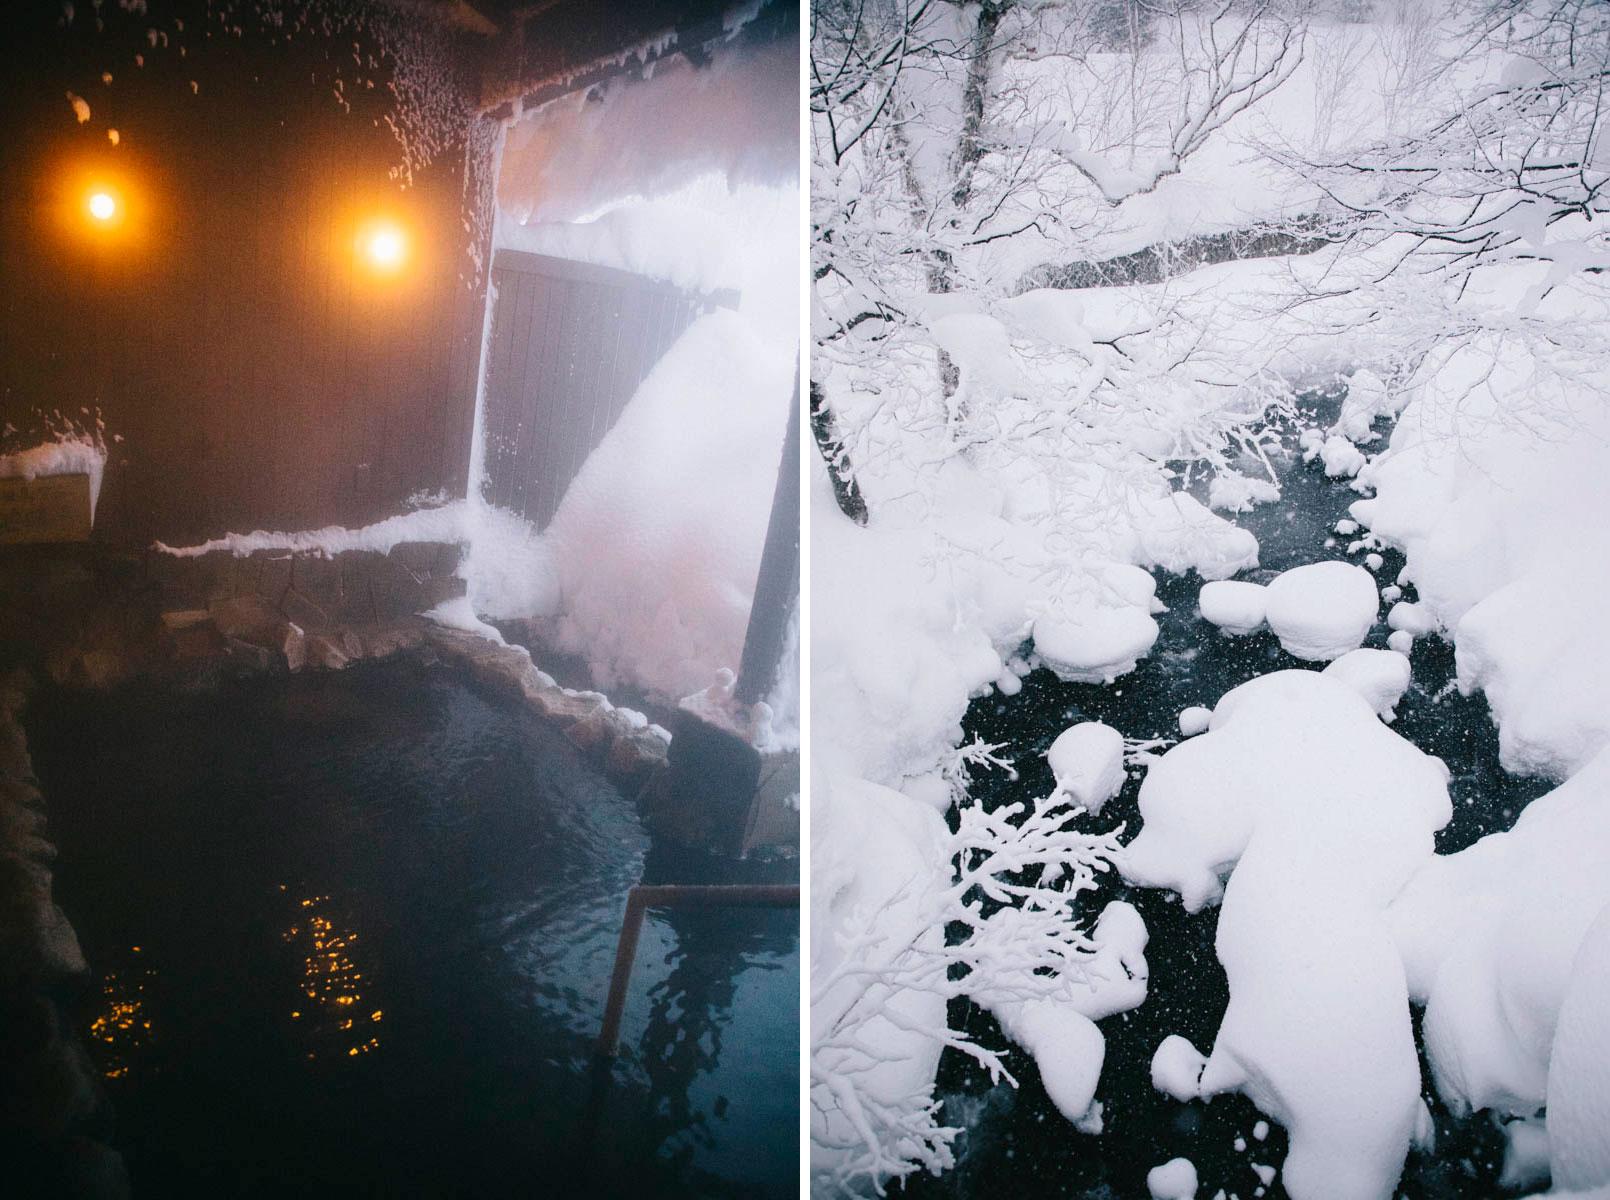 Onsen asahidake neige hiver higashikawa hokkaido japon